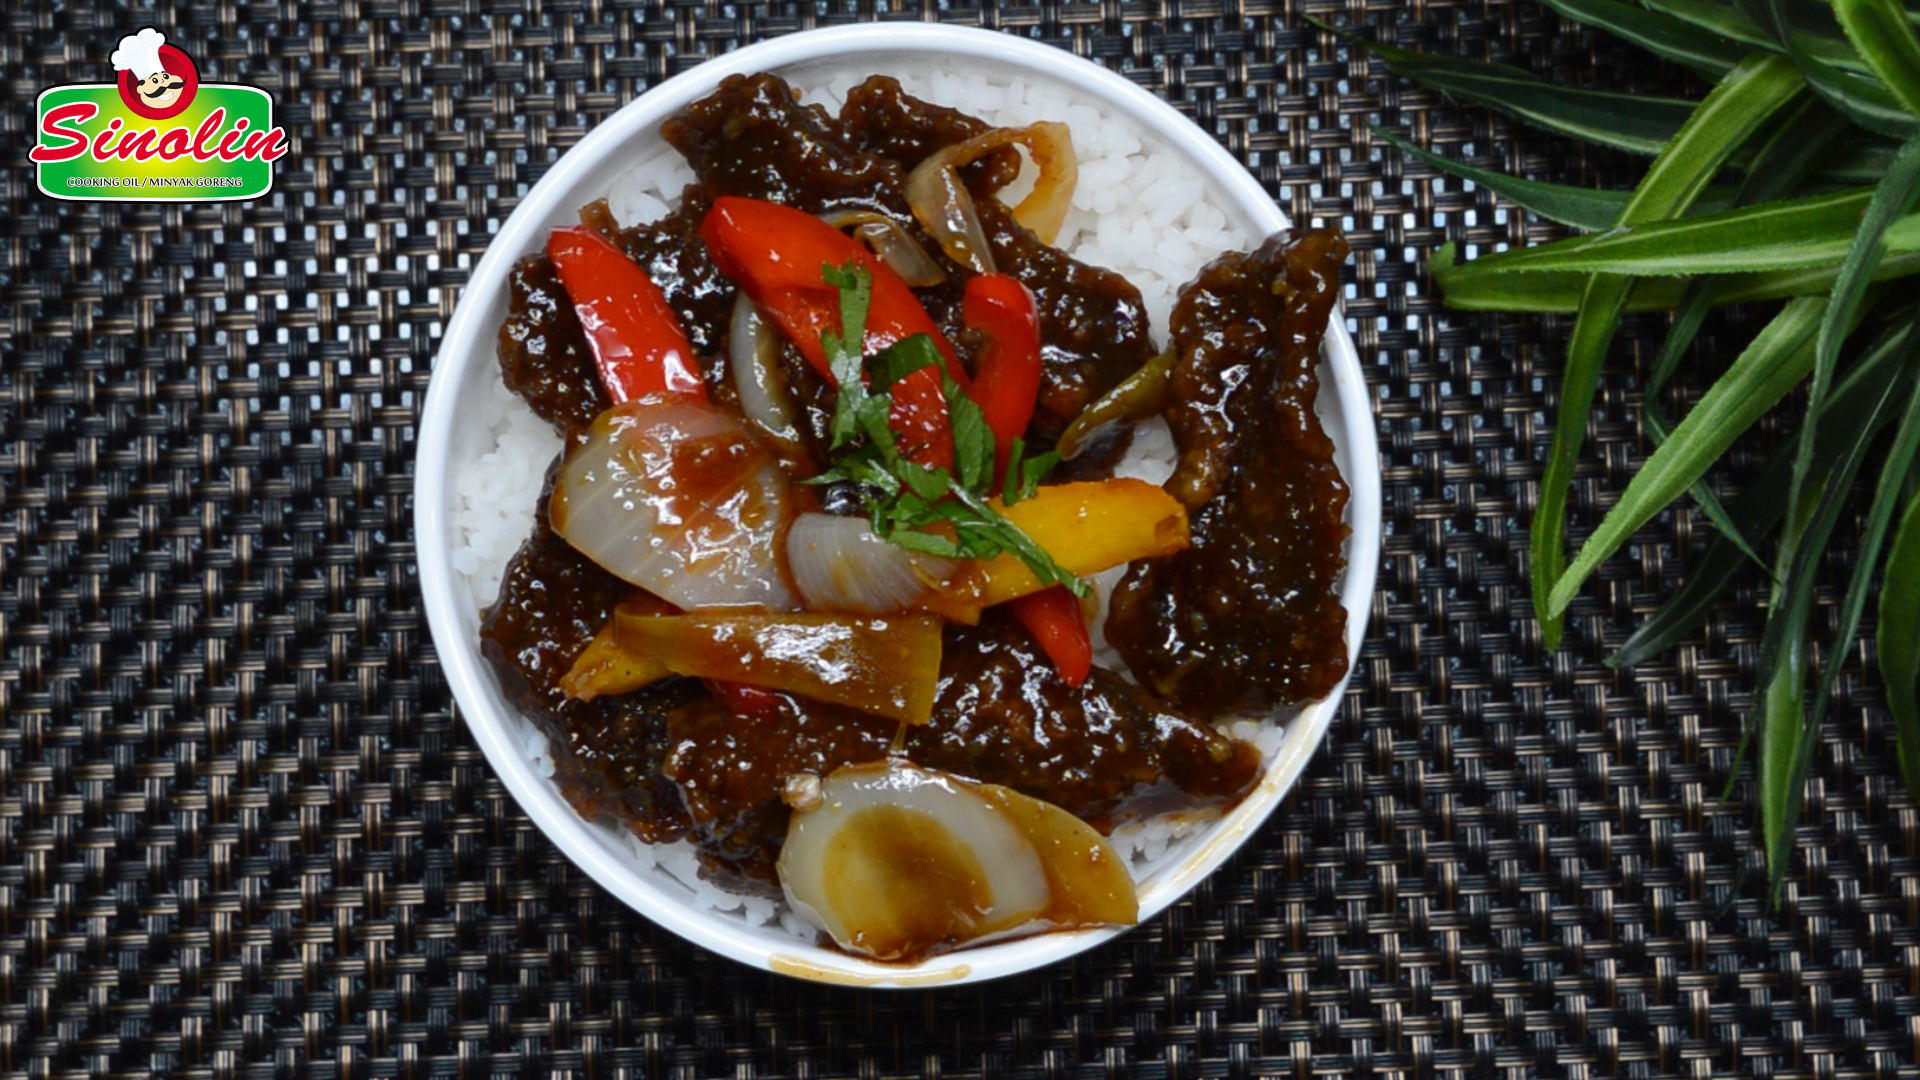 Crispy Sesame Beef By Dapur Sinolin